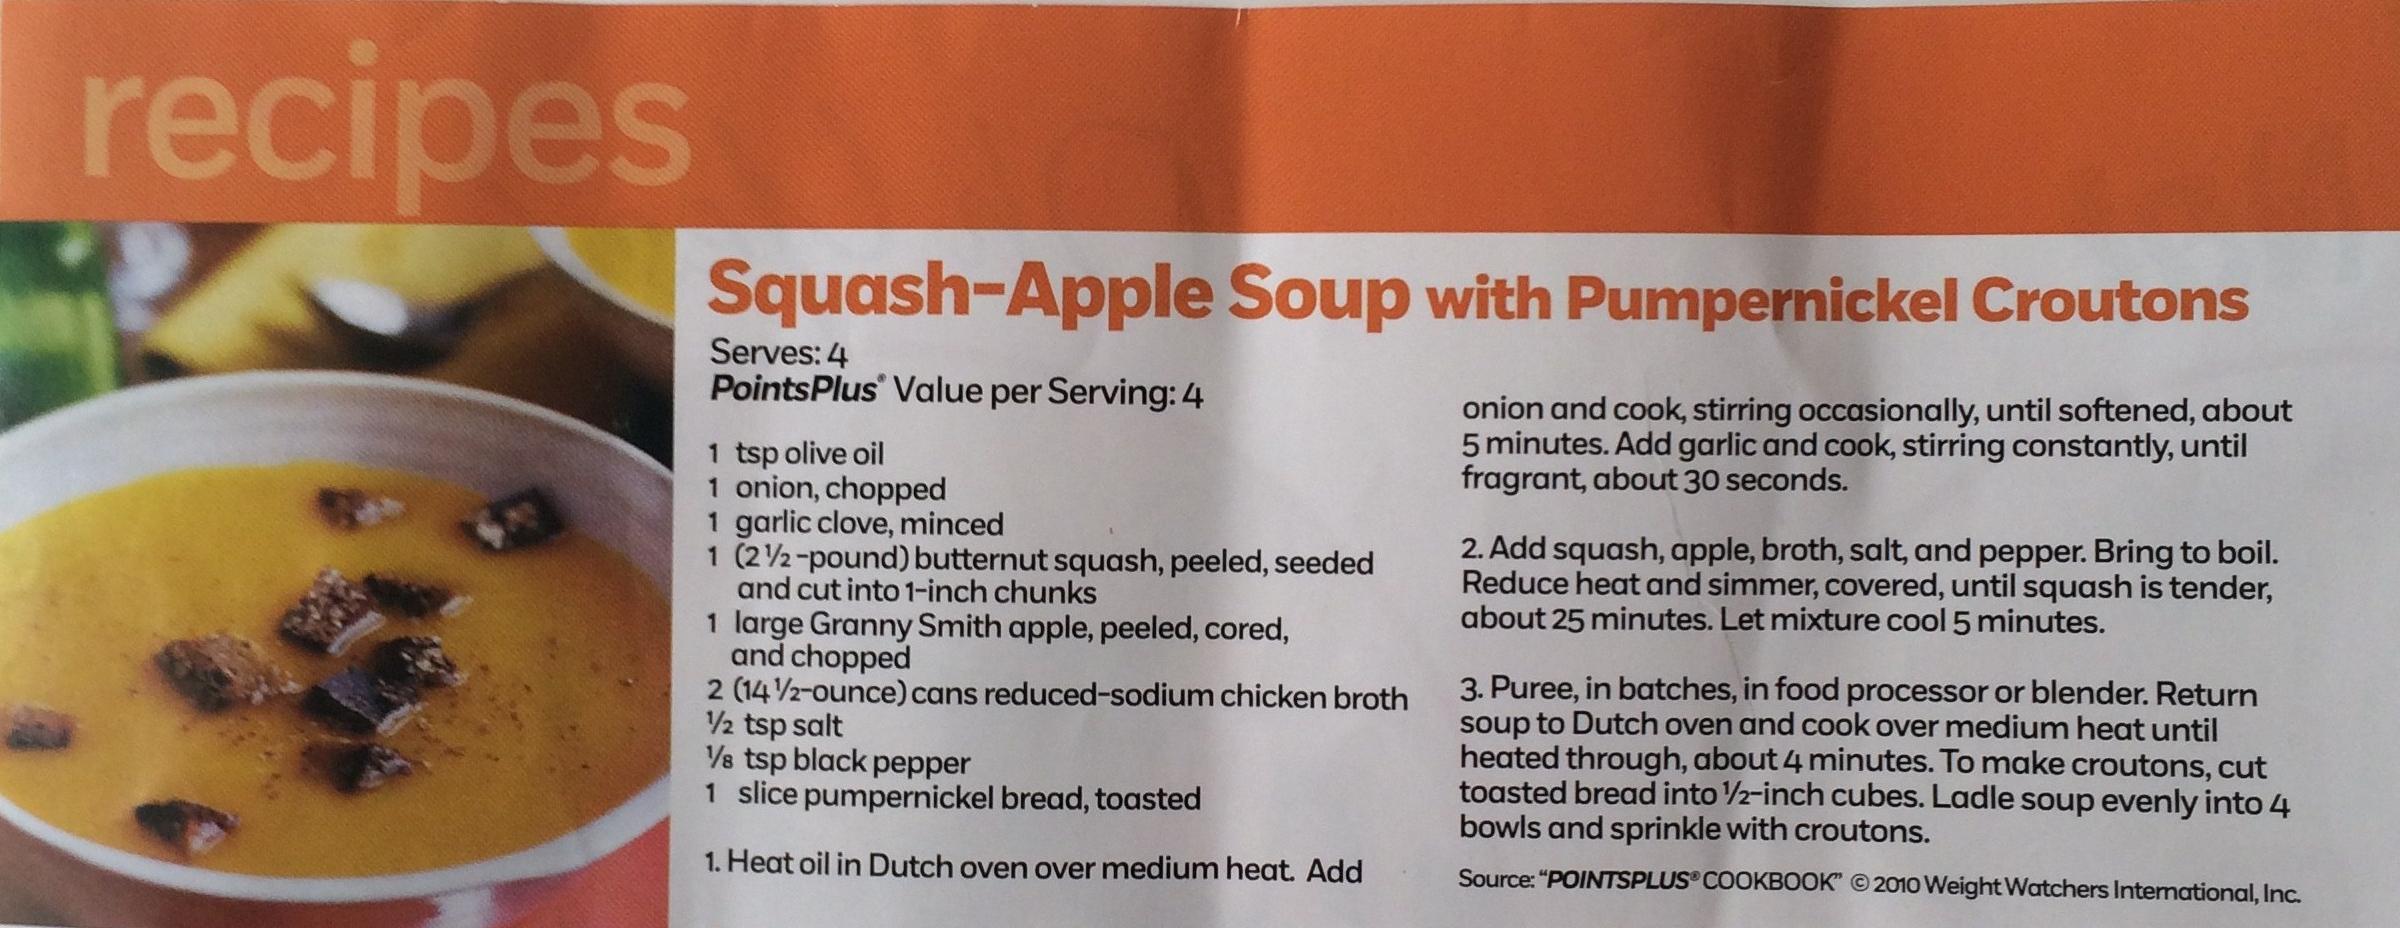 Squash Apple Soup Recipe Rose's Recipes